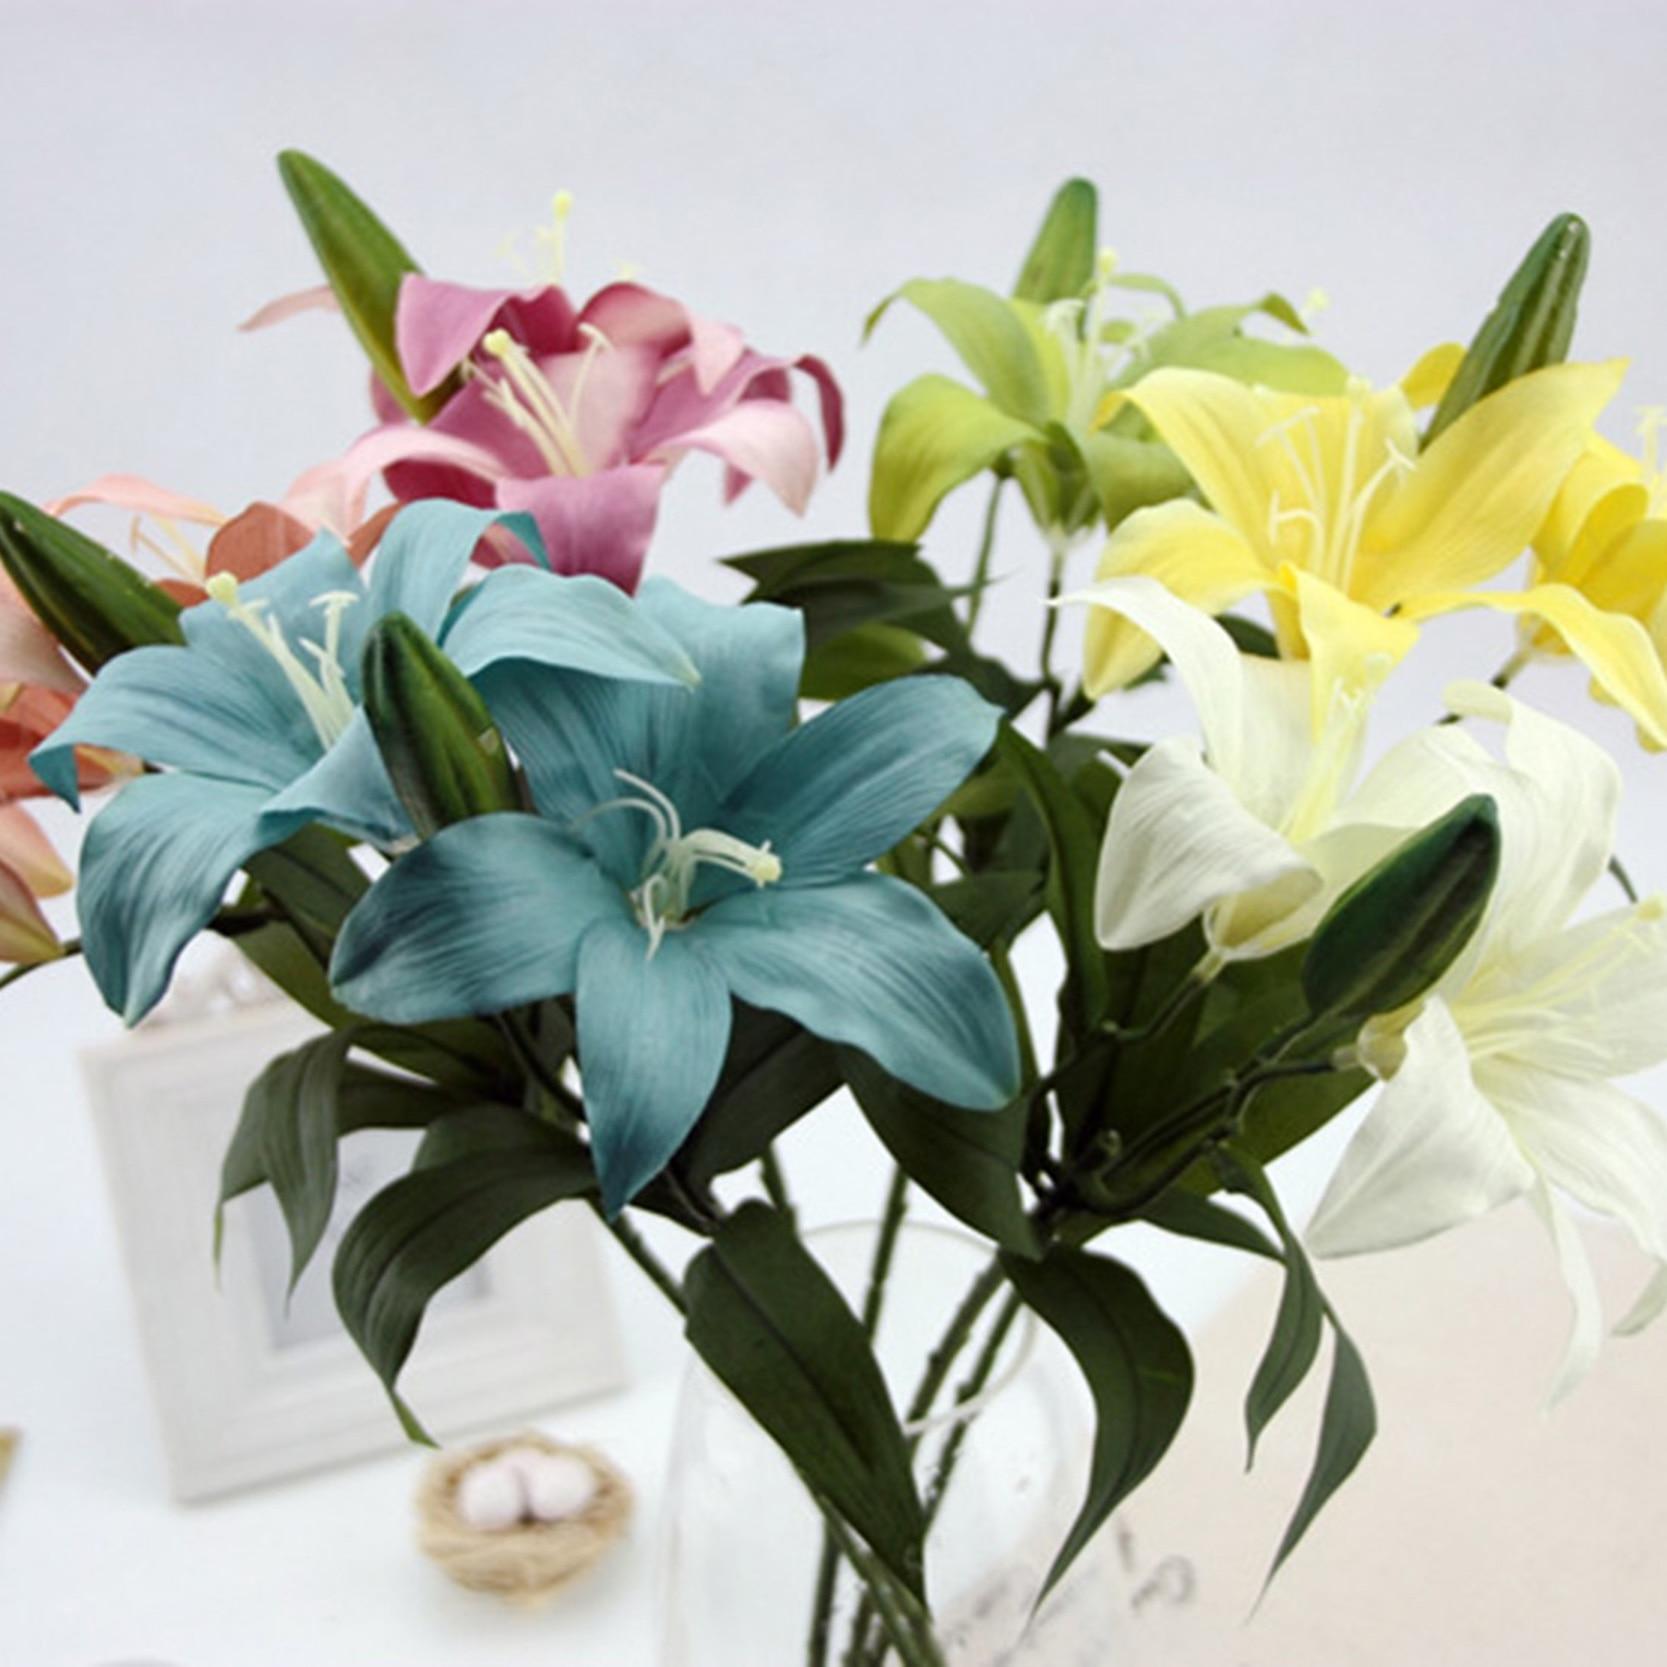 online get cheap wedding decoration lilis flowers aliexpress, Beautiful flower